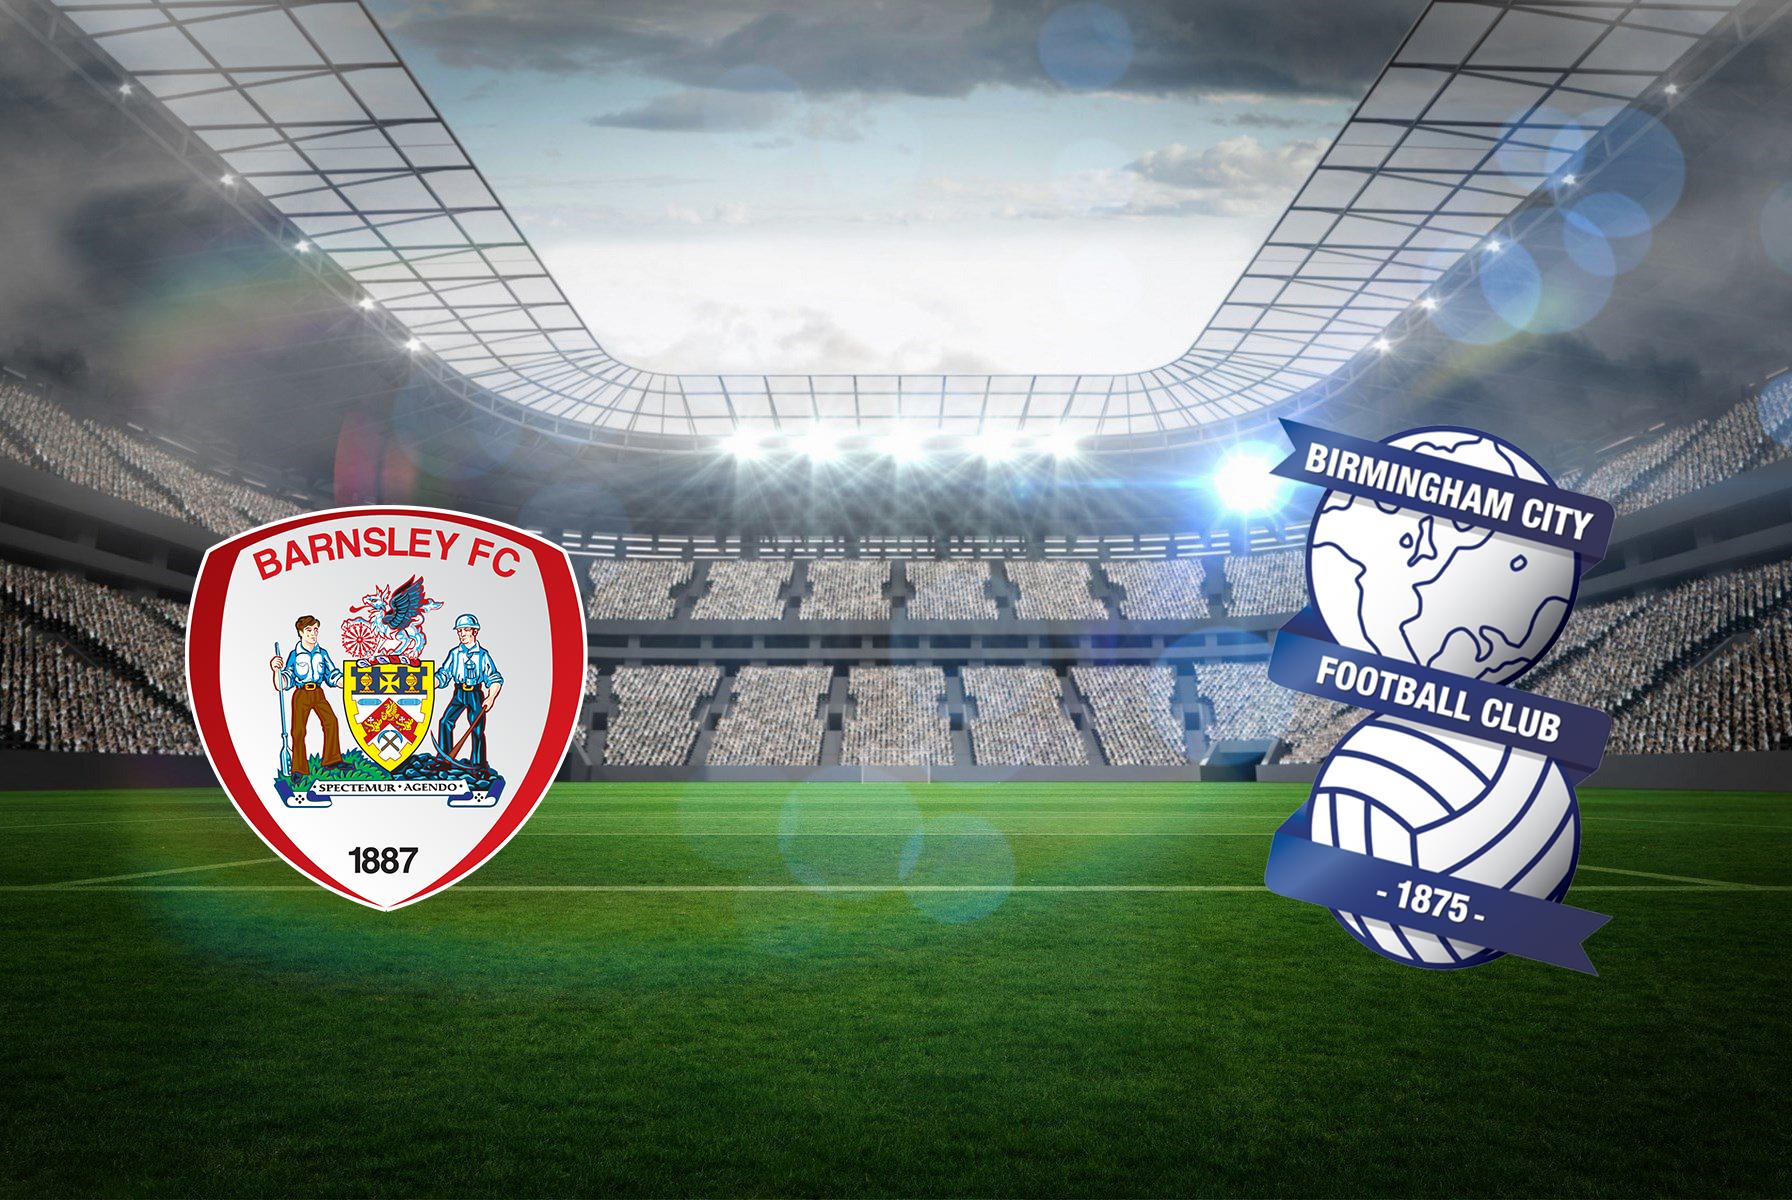 soi-keo-ca-cuoc-bong-da-ngay-9-2-Barnsley-vs-Birmingham-do-it-thang-do-nhieu-b9 1